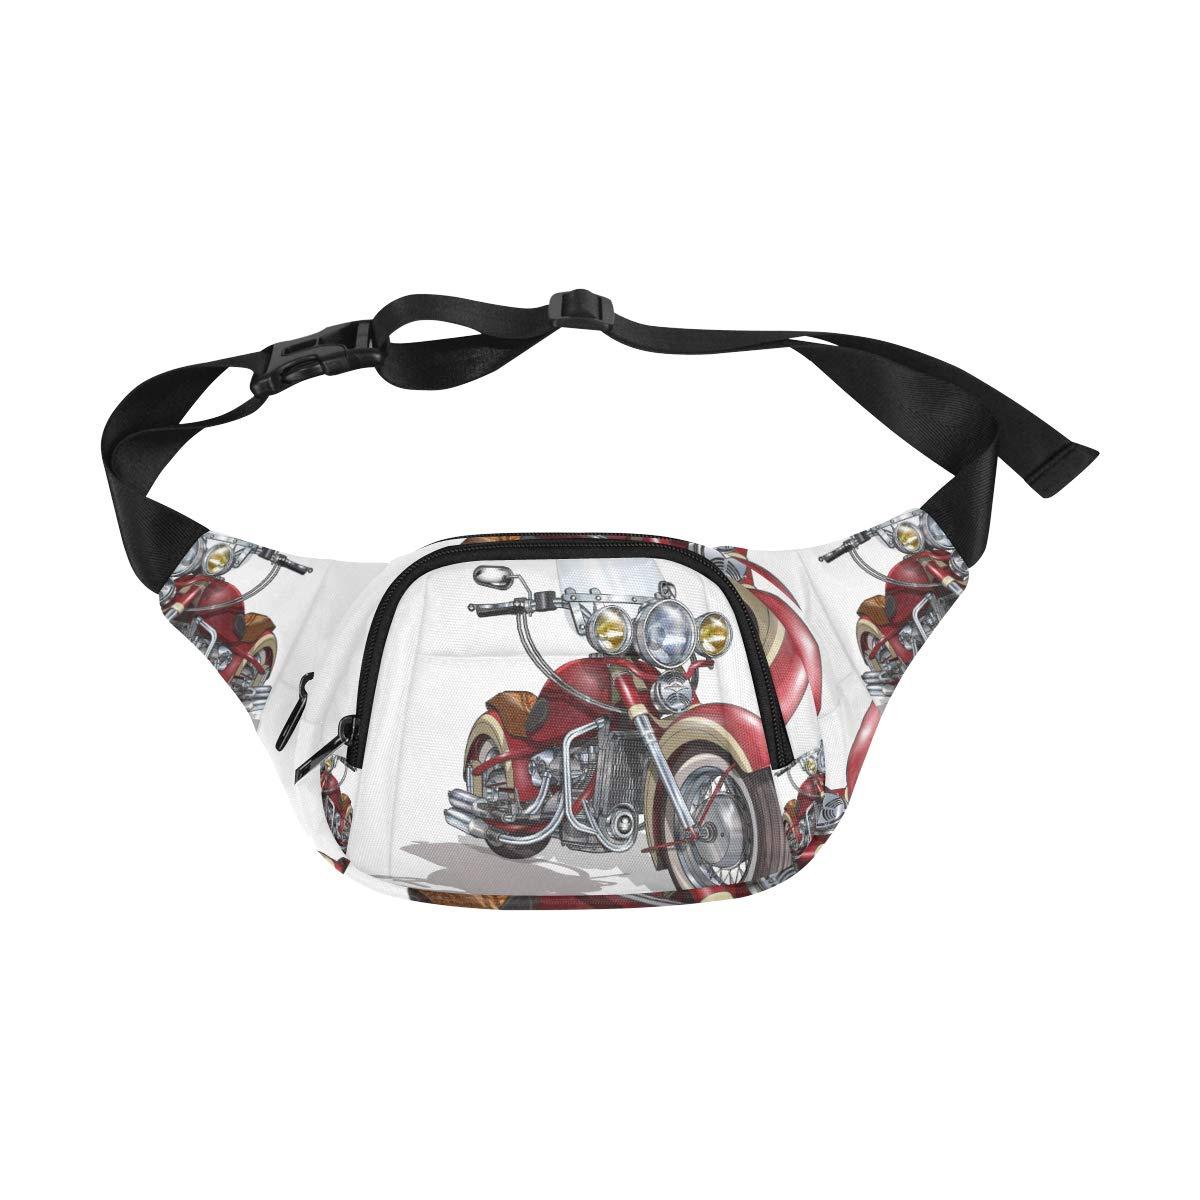 Hand Drawing Motorcycle Race Fenny Packs Waist Bags Adjustable Belt Waterproof Nylon Travel Running Sport Vacation Party For Men Women Boys Girls Kids